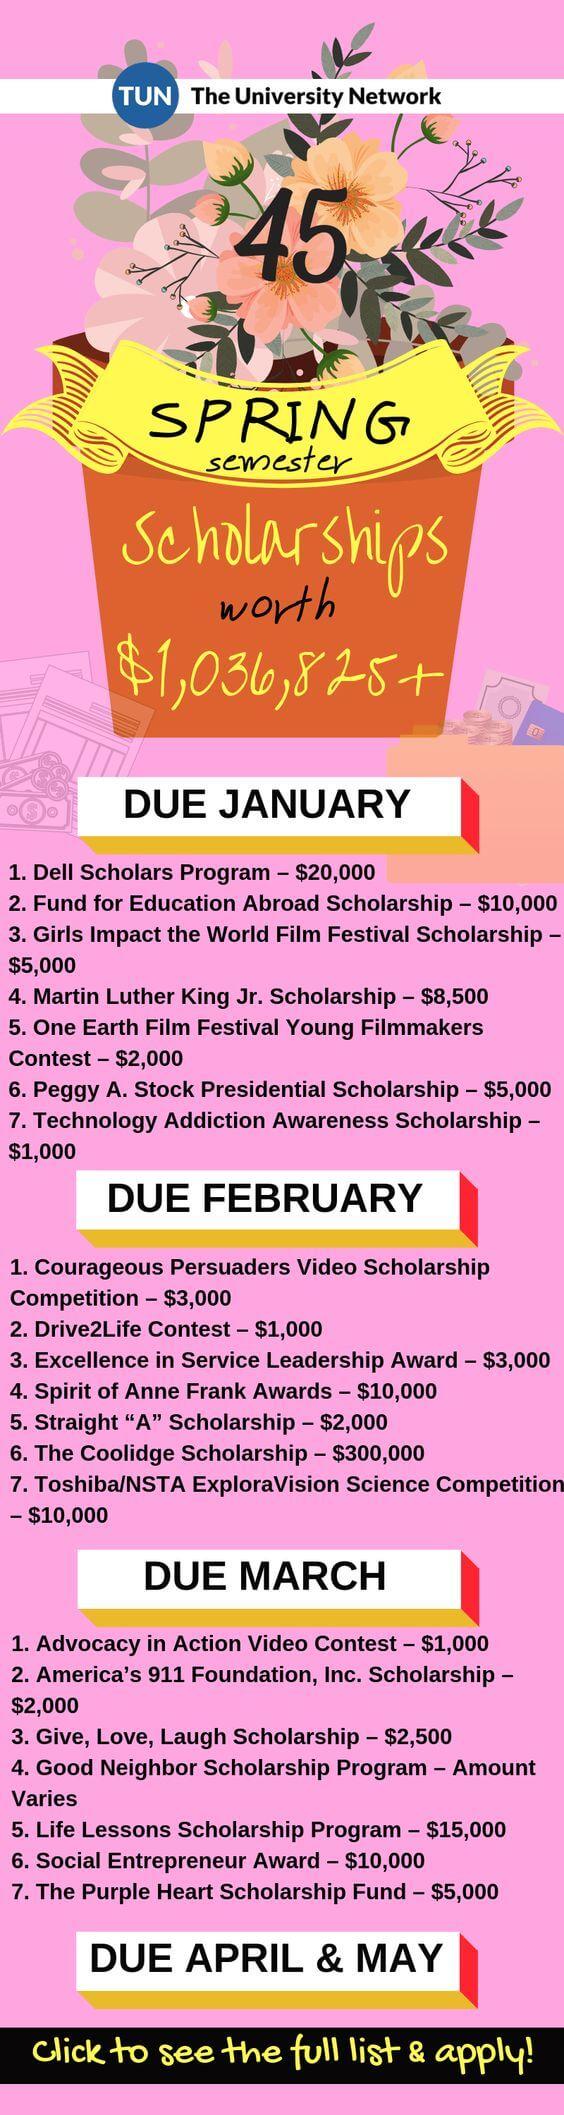 spring semester scholarships